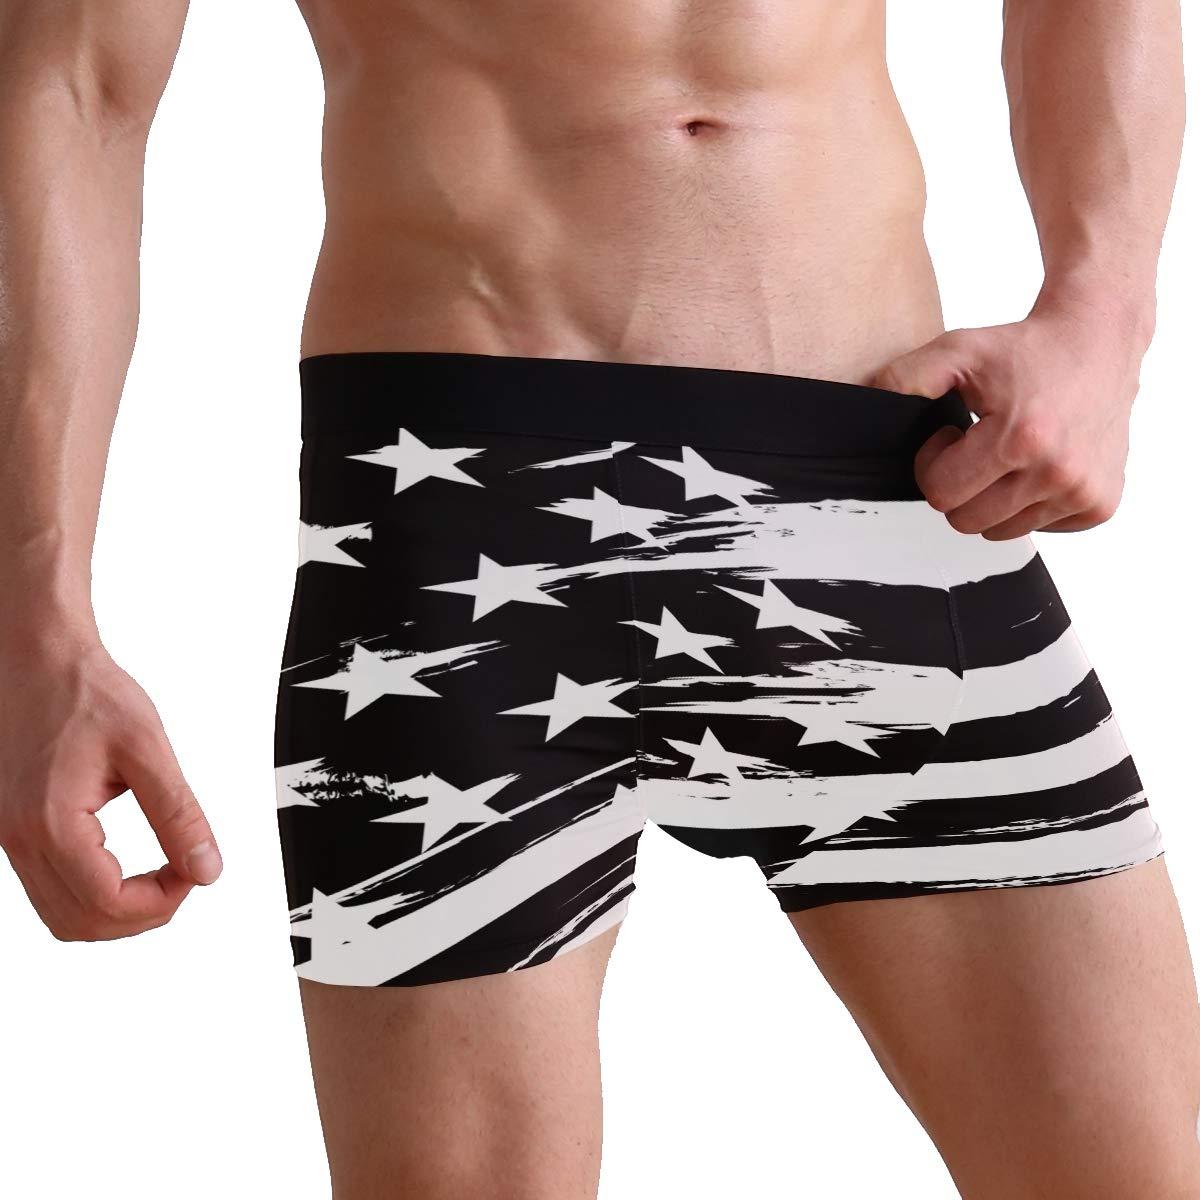 ZZKKO Retro American Flag Mens Boxer Briefs Underwear Breathable Stretch Boxer Trunk with Pouch S-XL